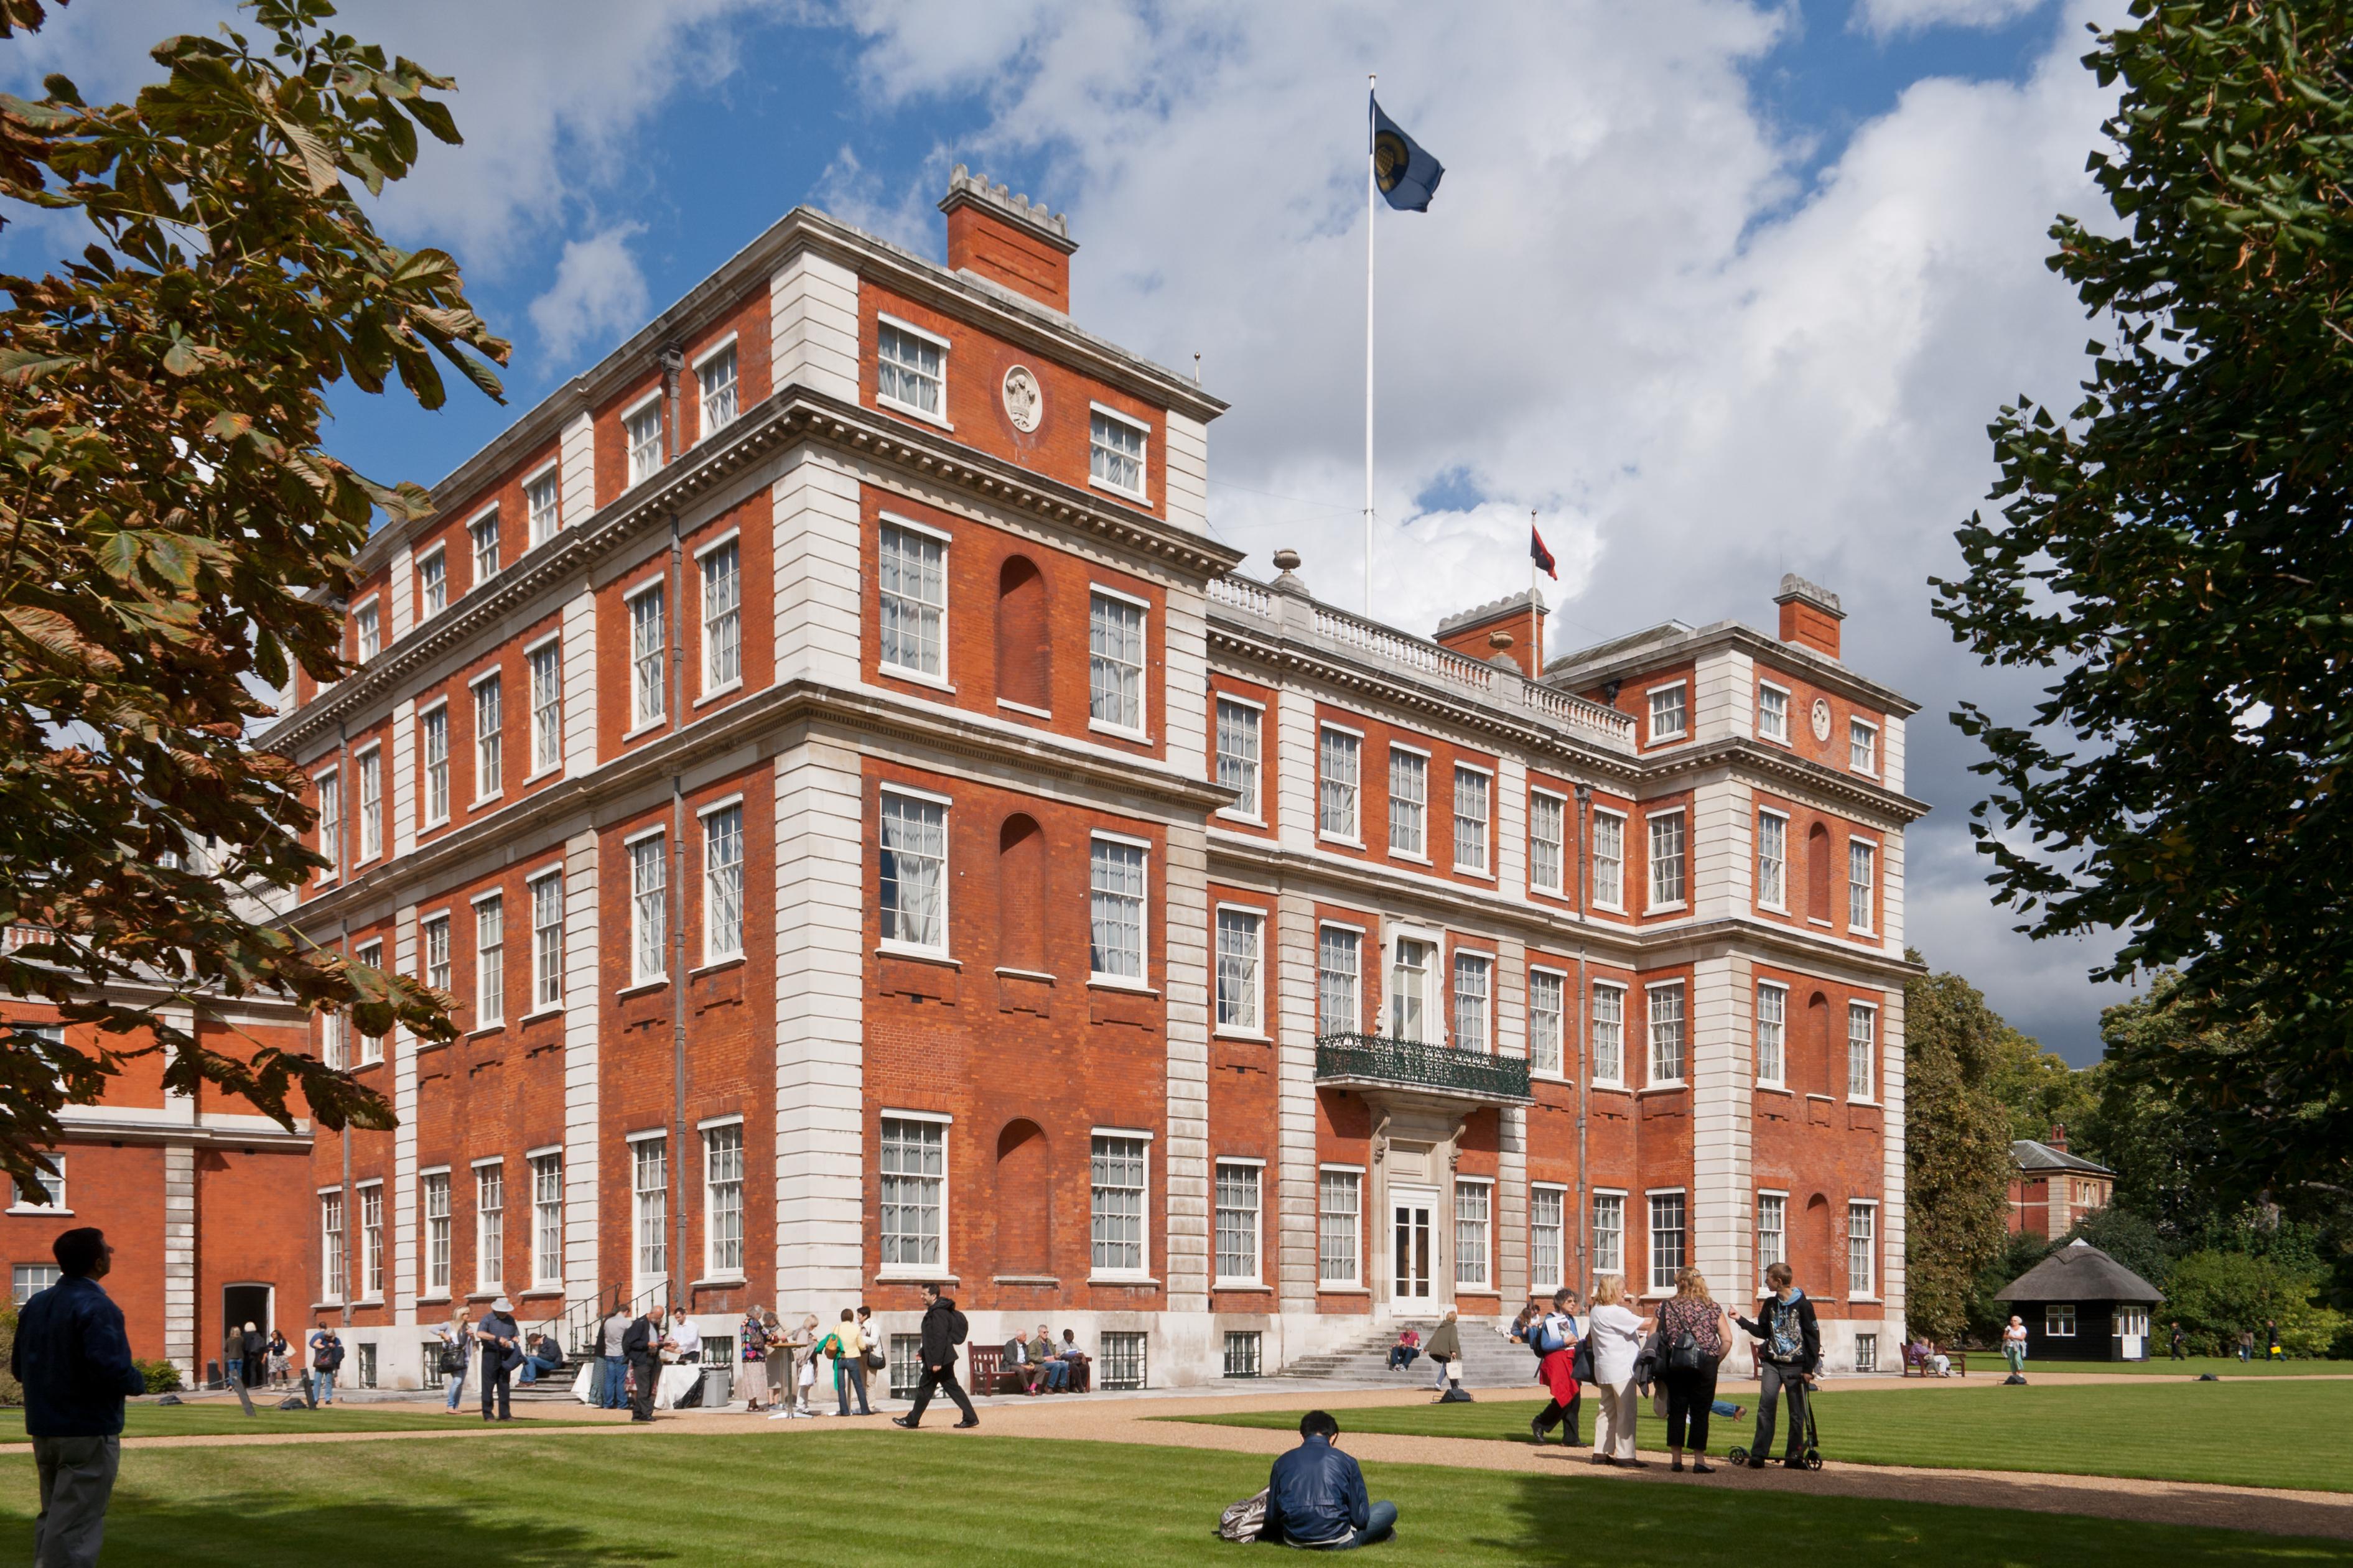 File:Marlborough House, south side.jpg - Wikimedia Commons